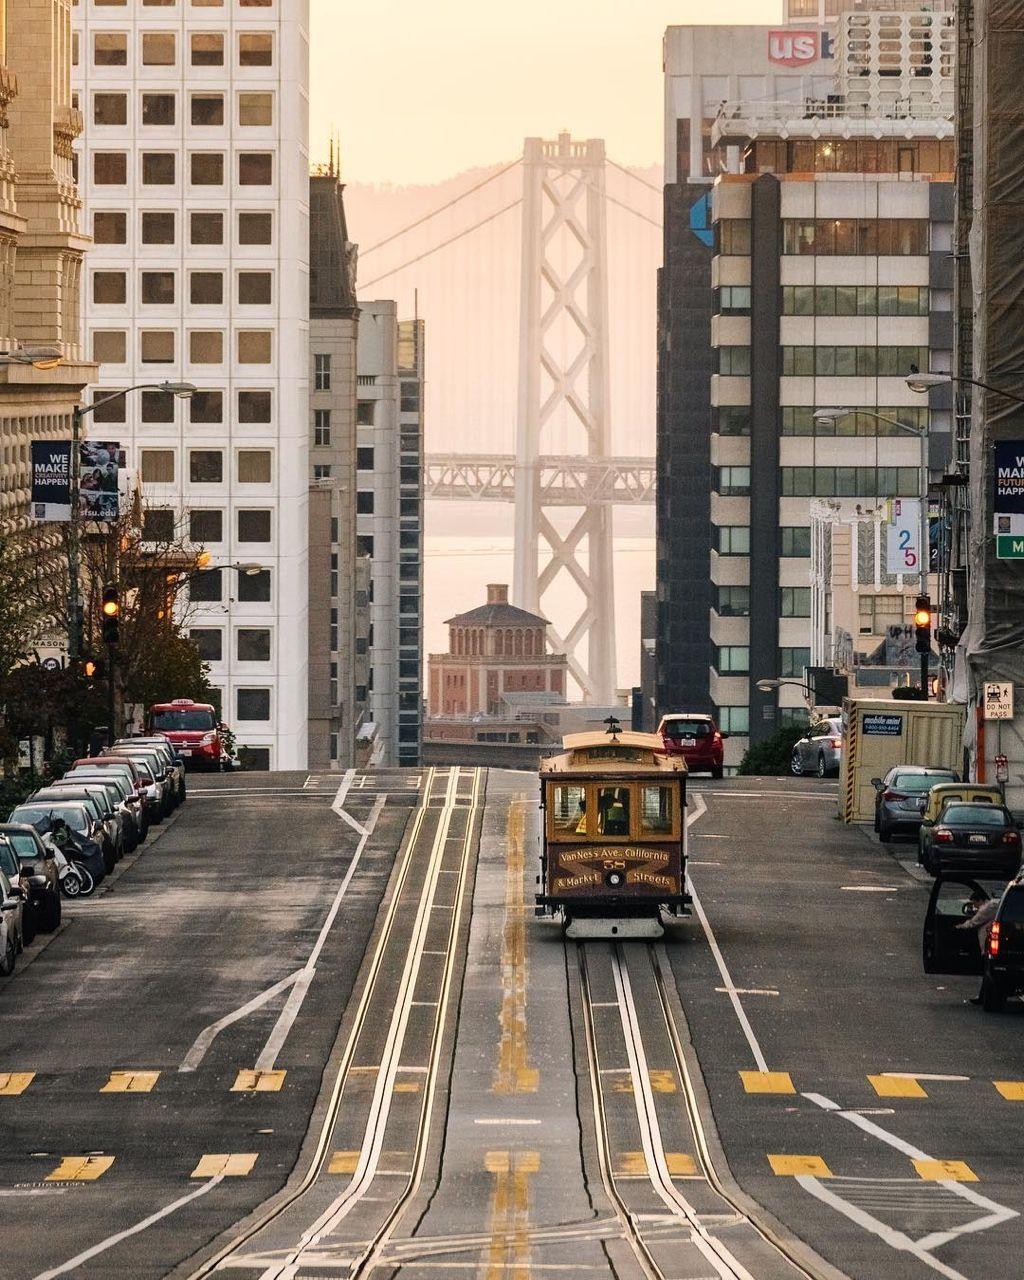 The Best Photos Of San Francisco Including The Golden Gate Bridge